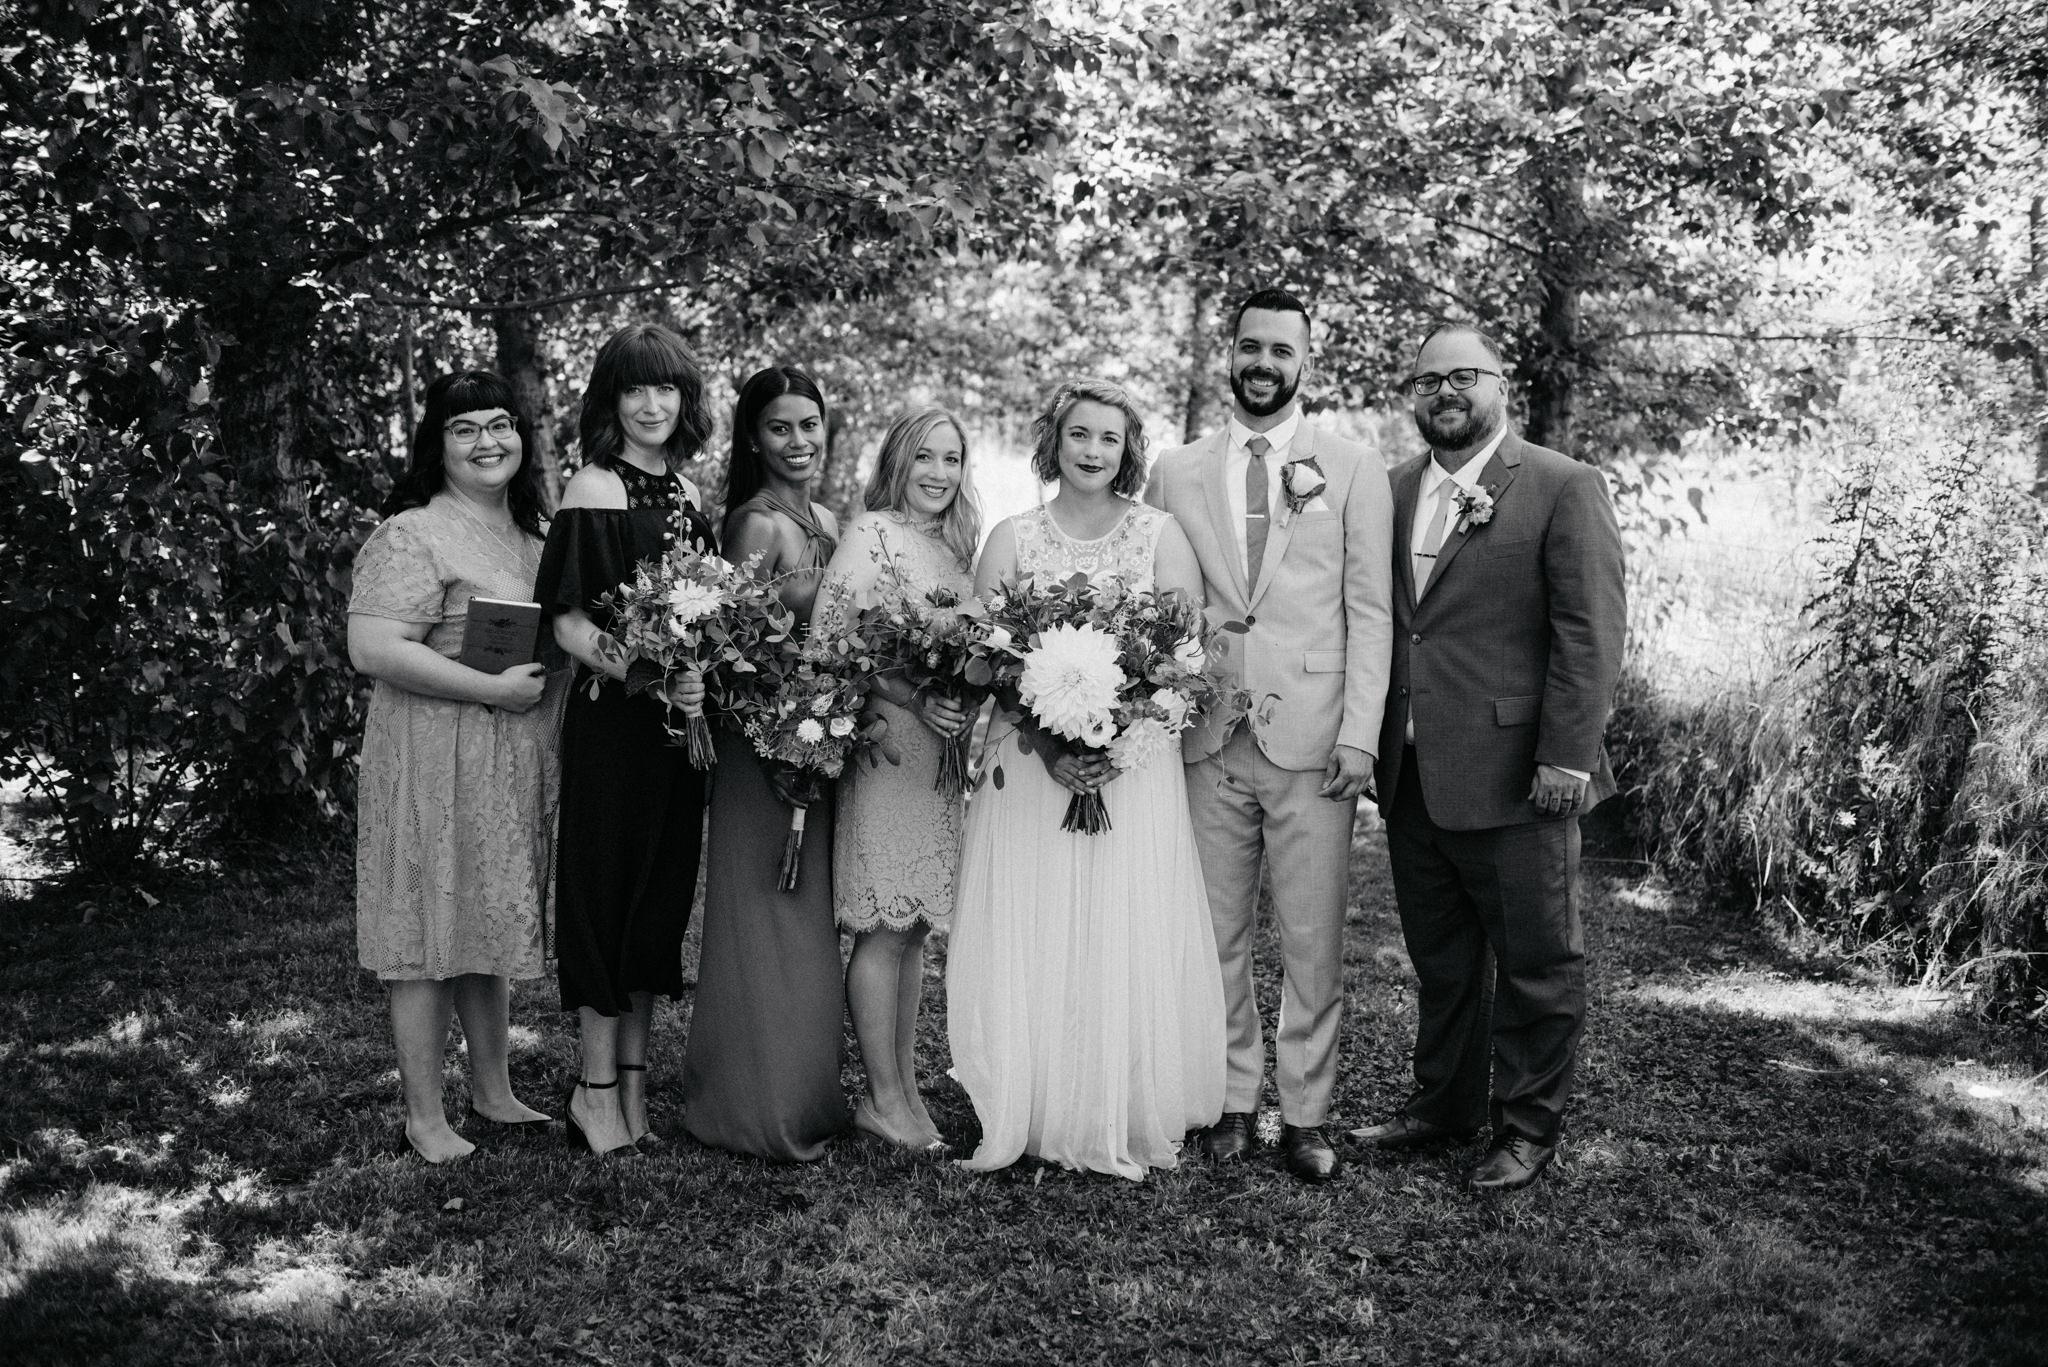 Amy Steven Seattle Wedding Photographer Vishal Goklani_025.jpg